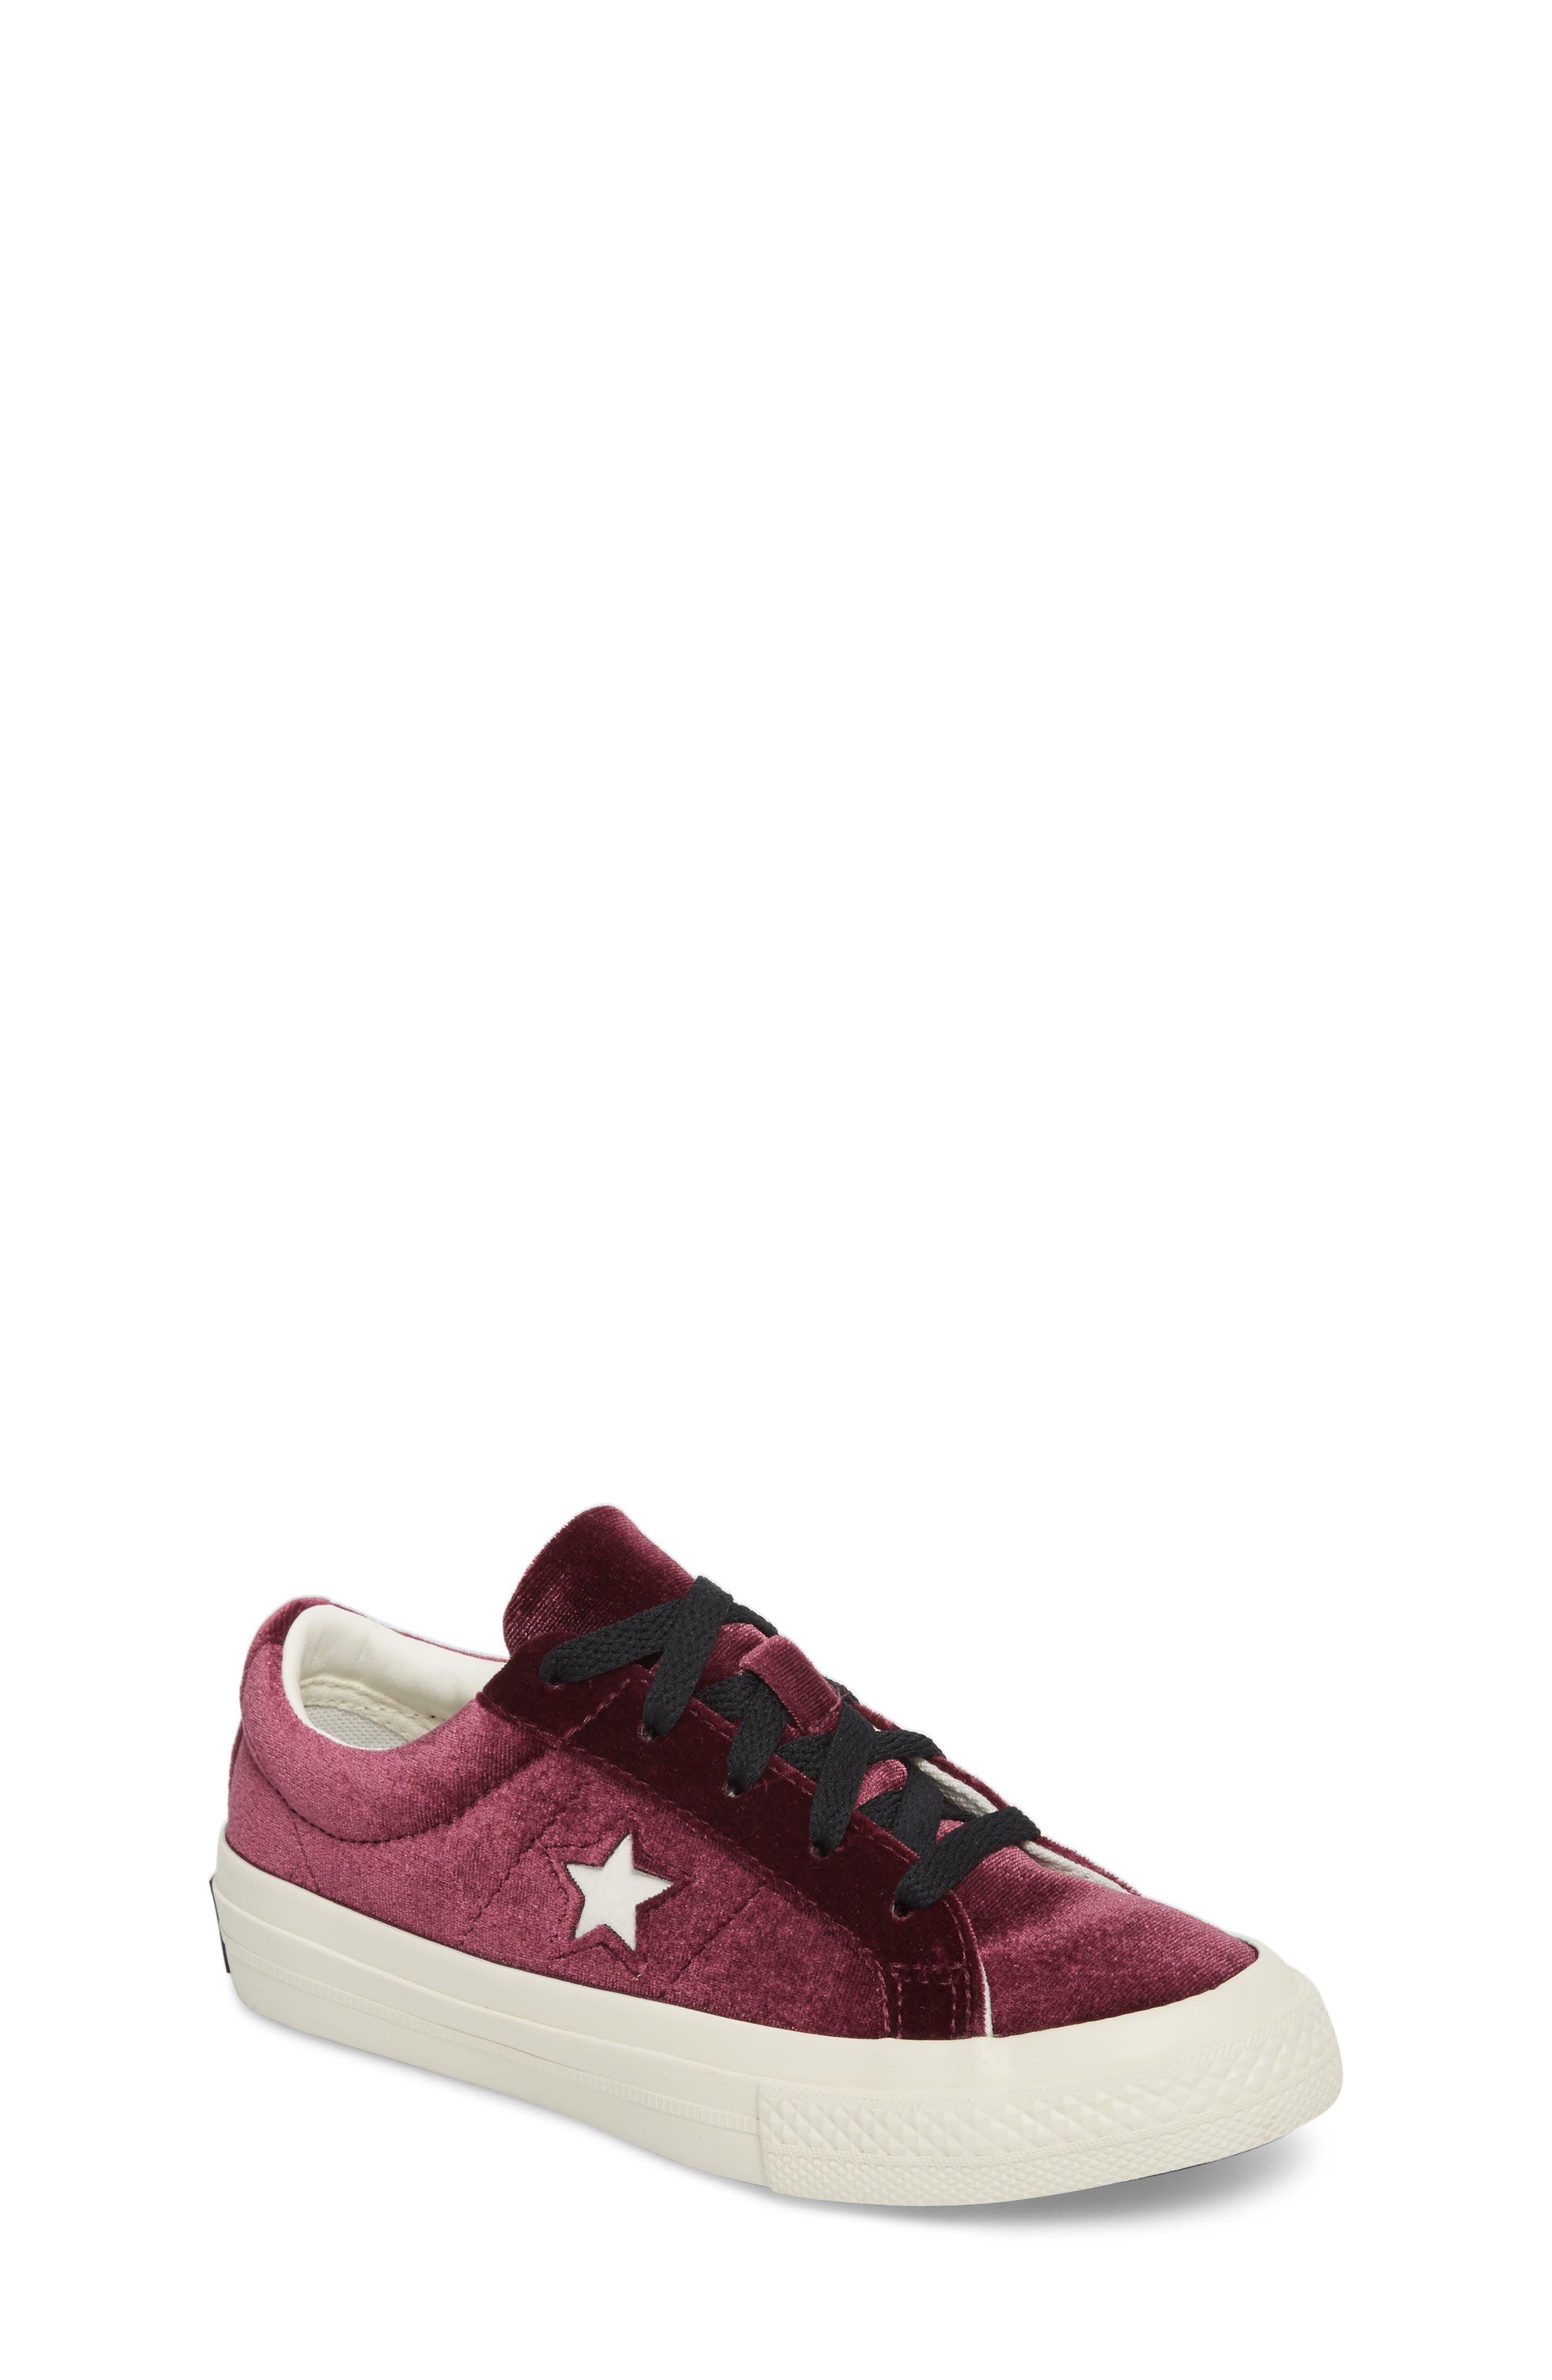 Alternate Image 1 Selected - Converse Chuck Taylor® All Star® One Star Velvet Platform Sneaker (Toddler, Little Kid & Big Kid)